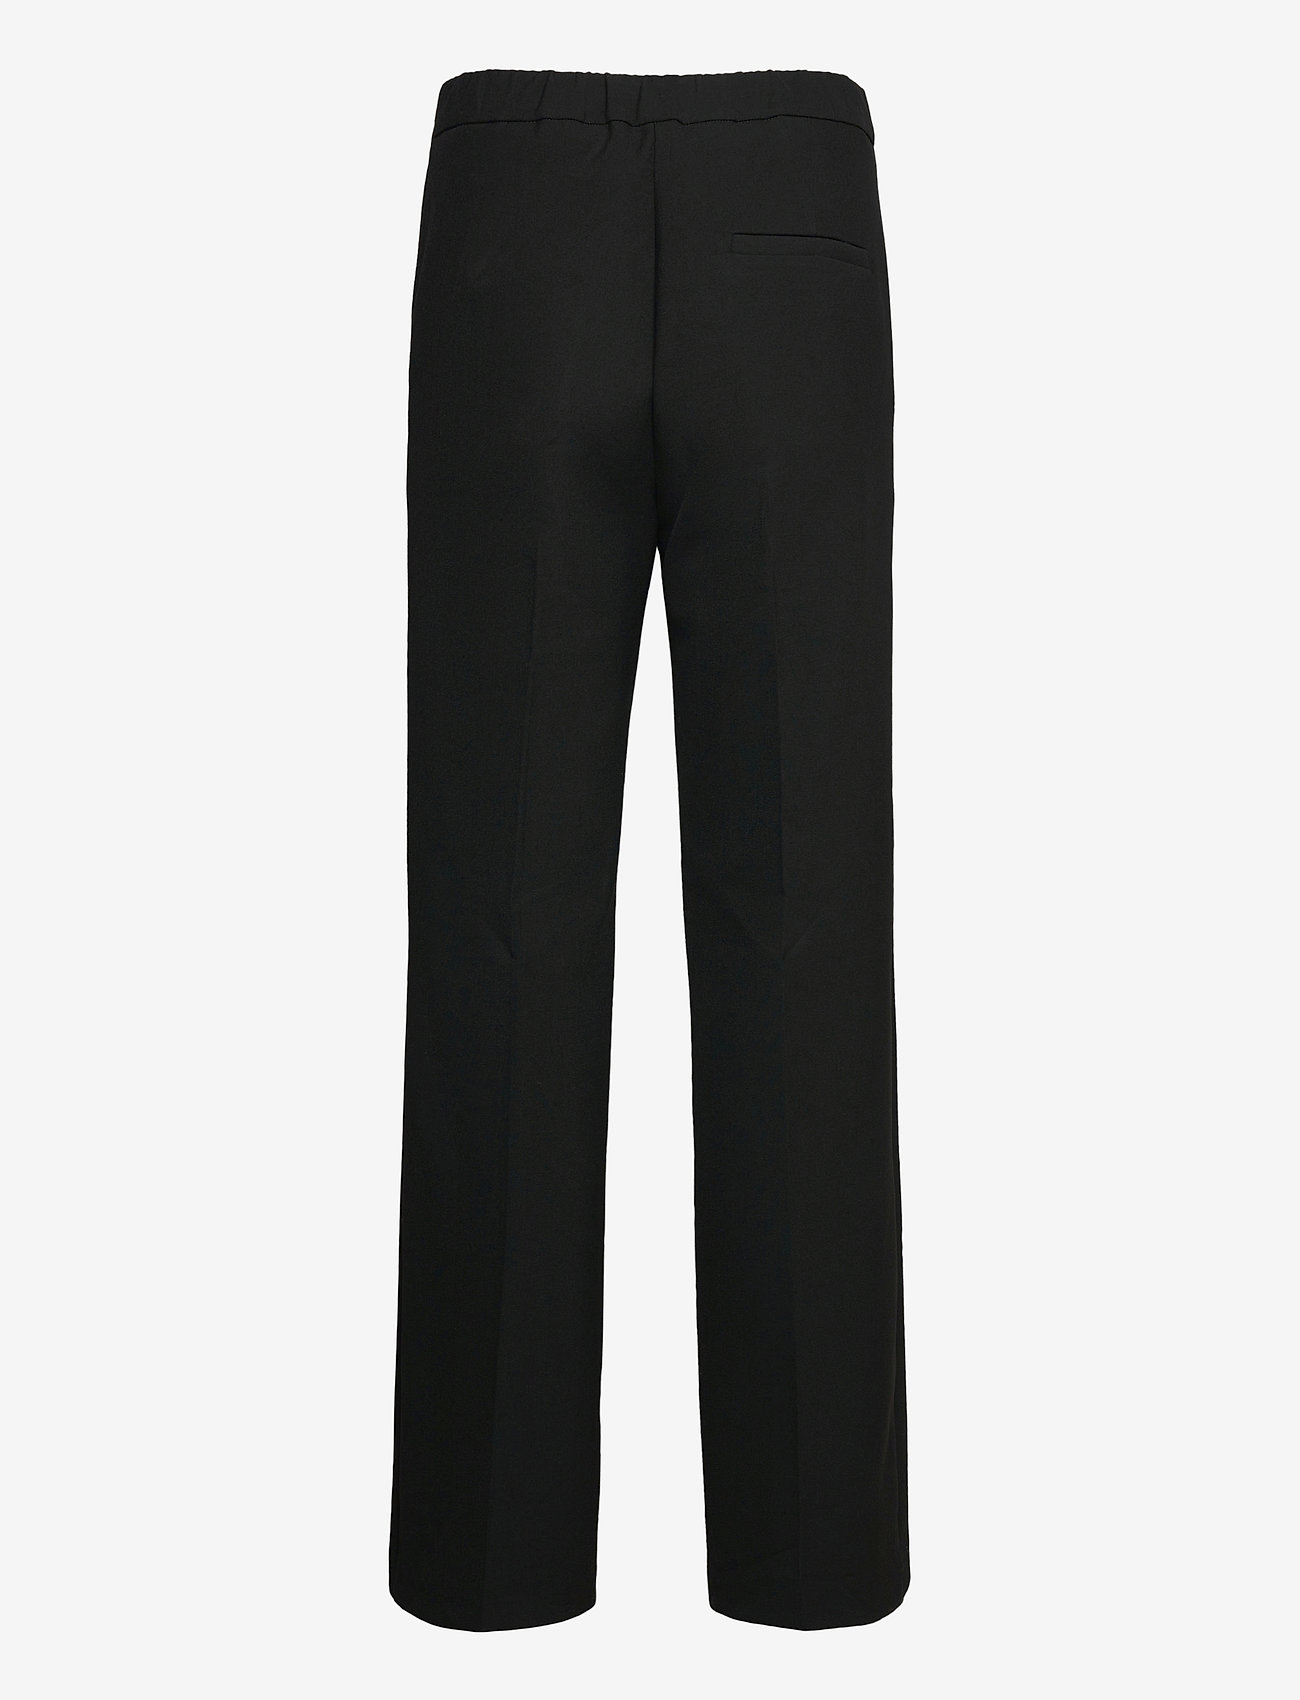 Marimekko - HAKKU LONG SOLID TROUSERS - bukser med lige ben - black - 1